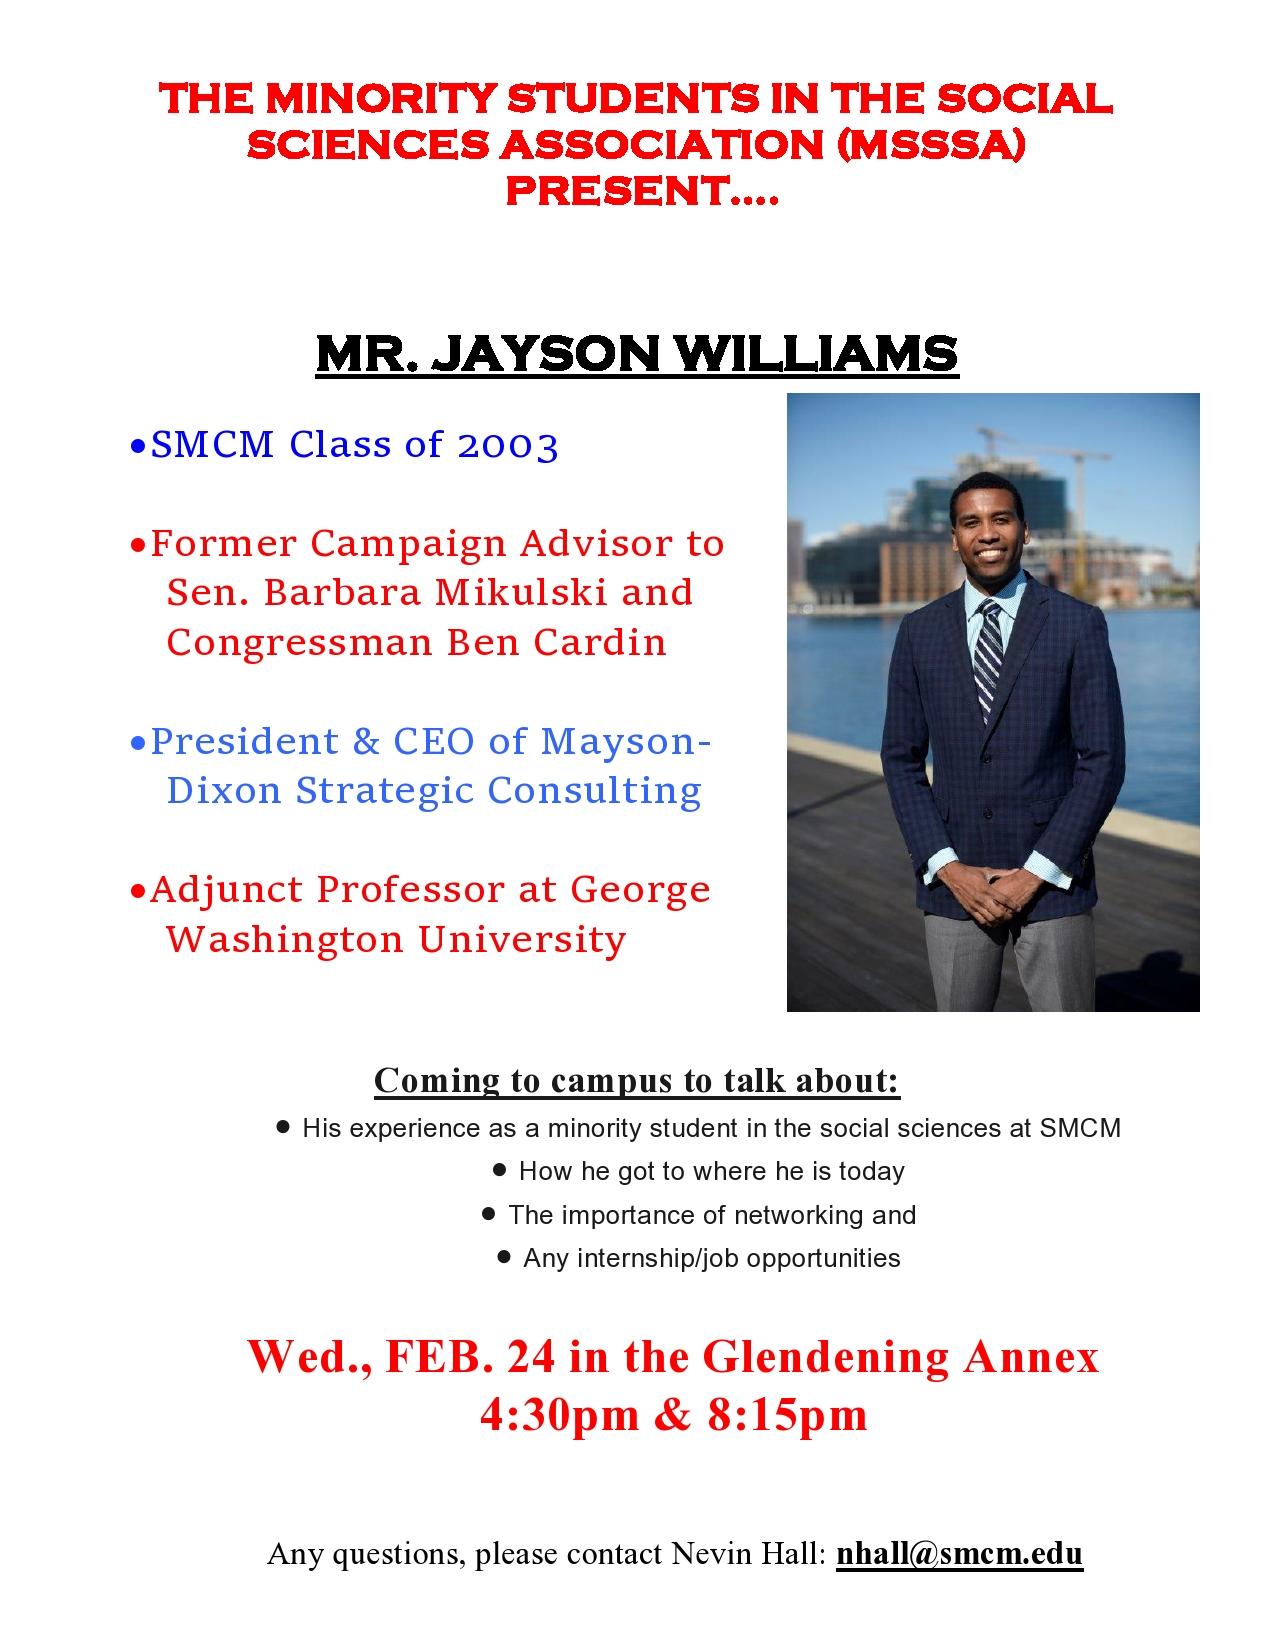 Jayson Williams MSSSA poster